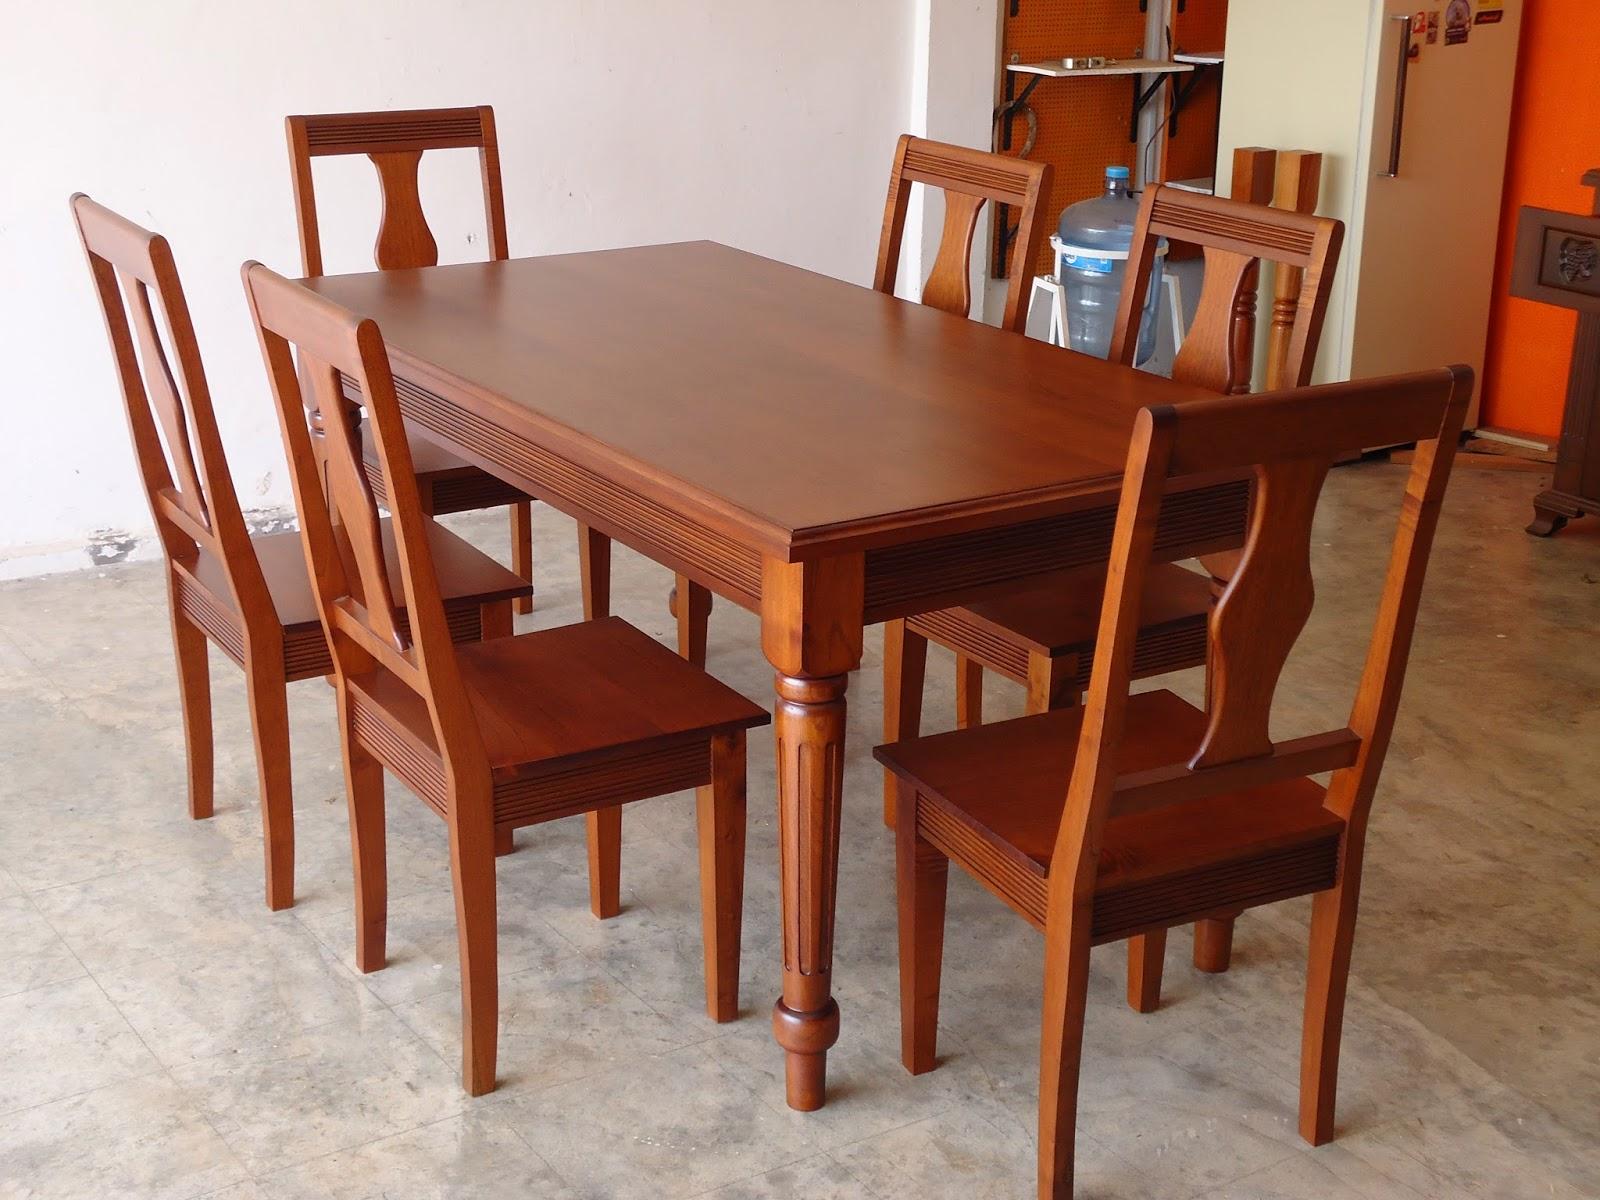 Comedor rectangular 4 sillas de lujo madera coaster bs for Fotos de comedores de madera